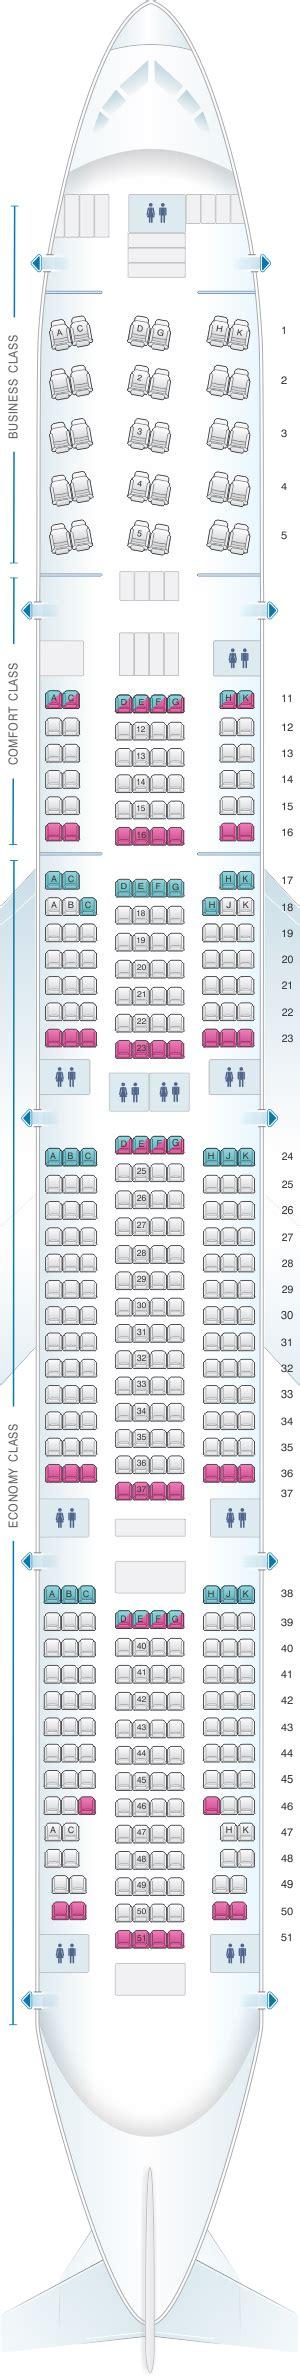 plan si es boeing 777 300er air plan de cabine aeroflot airlines boeing b777 300er